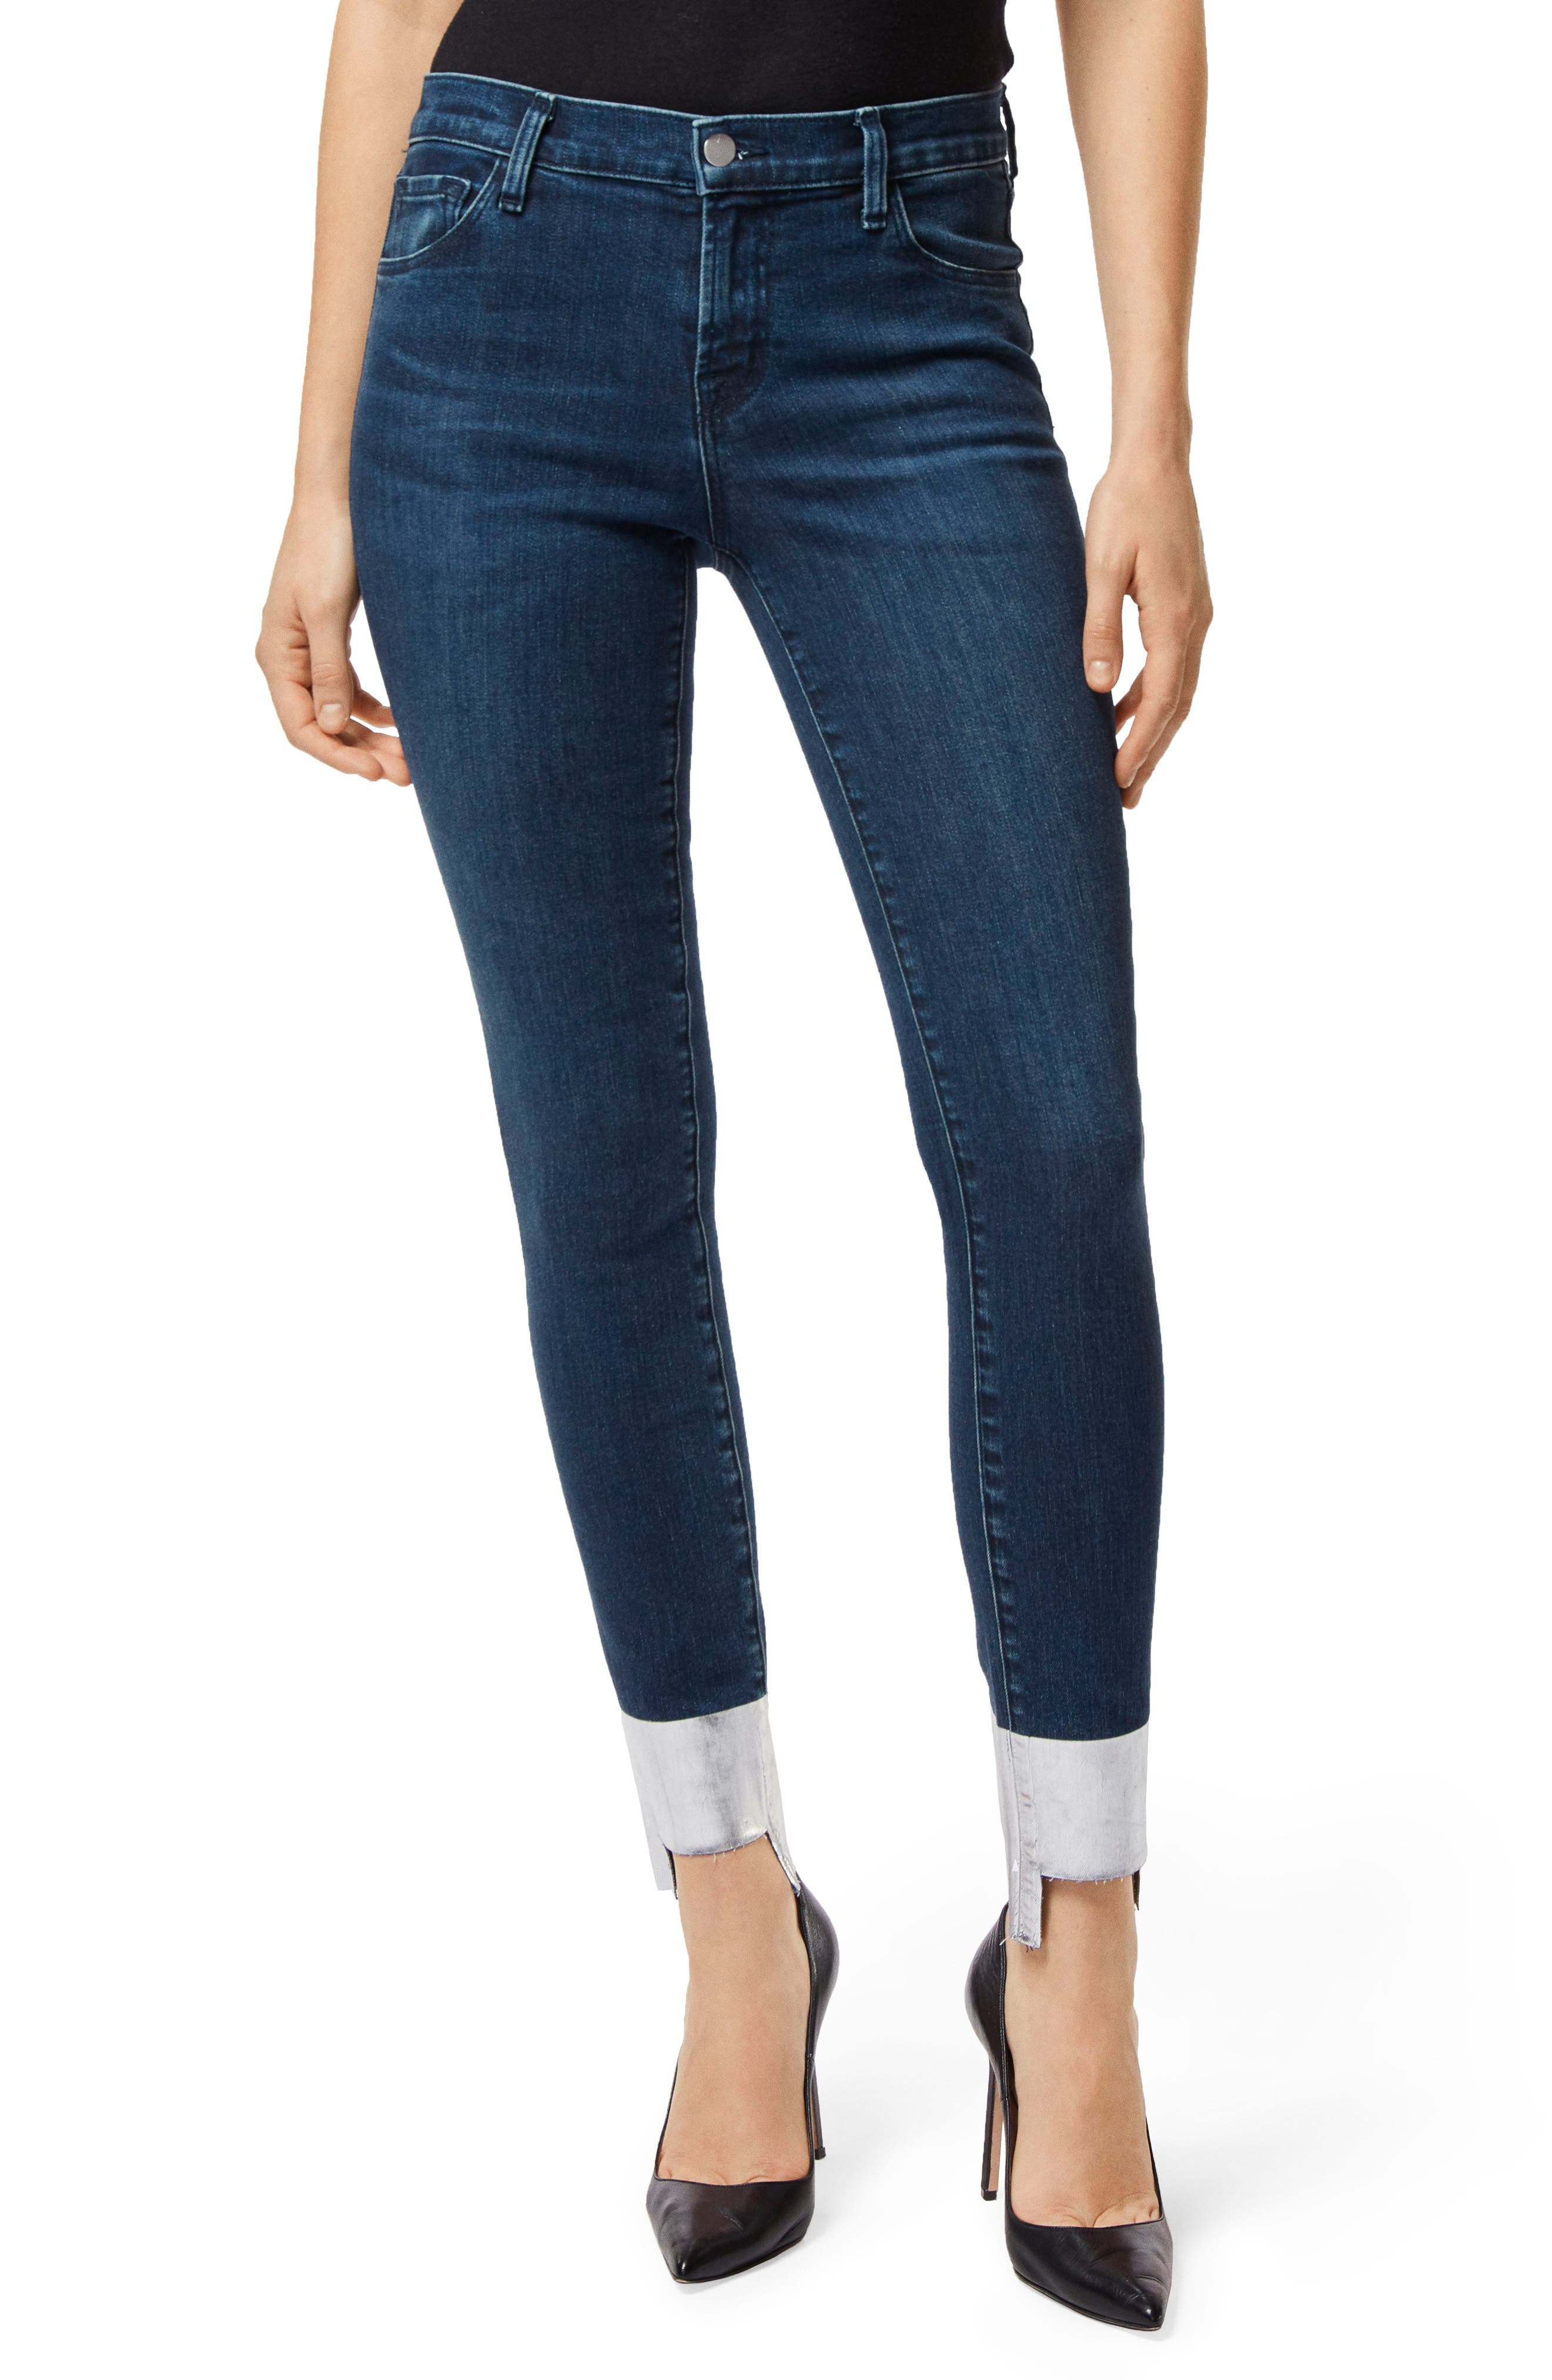 '811' Cutoff Step Hem Skinny Jeans,                             Main thumbnail 1, color,                             SILVER POOL